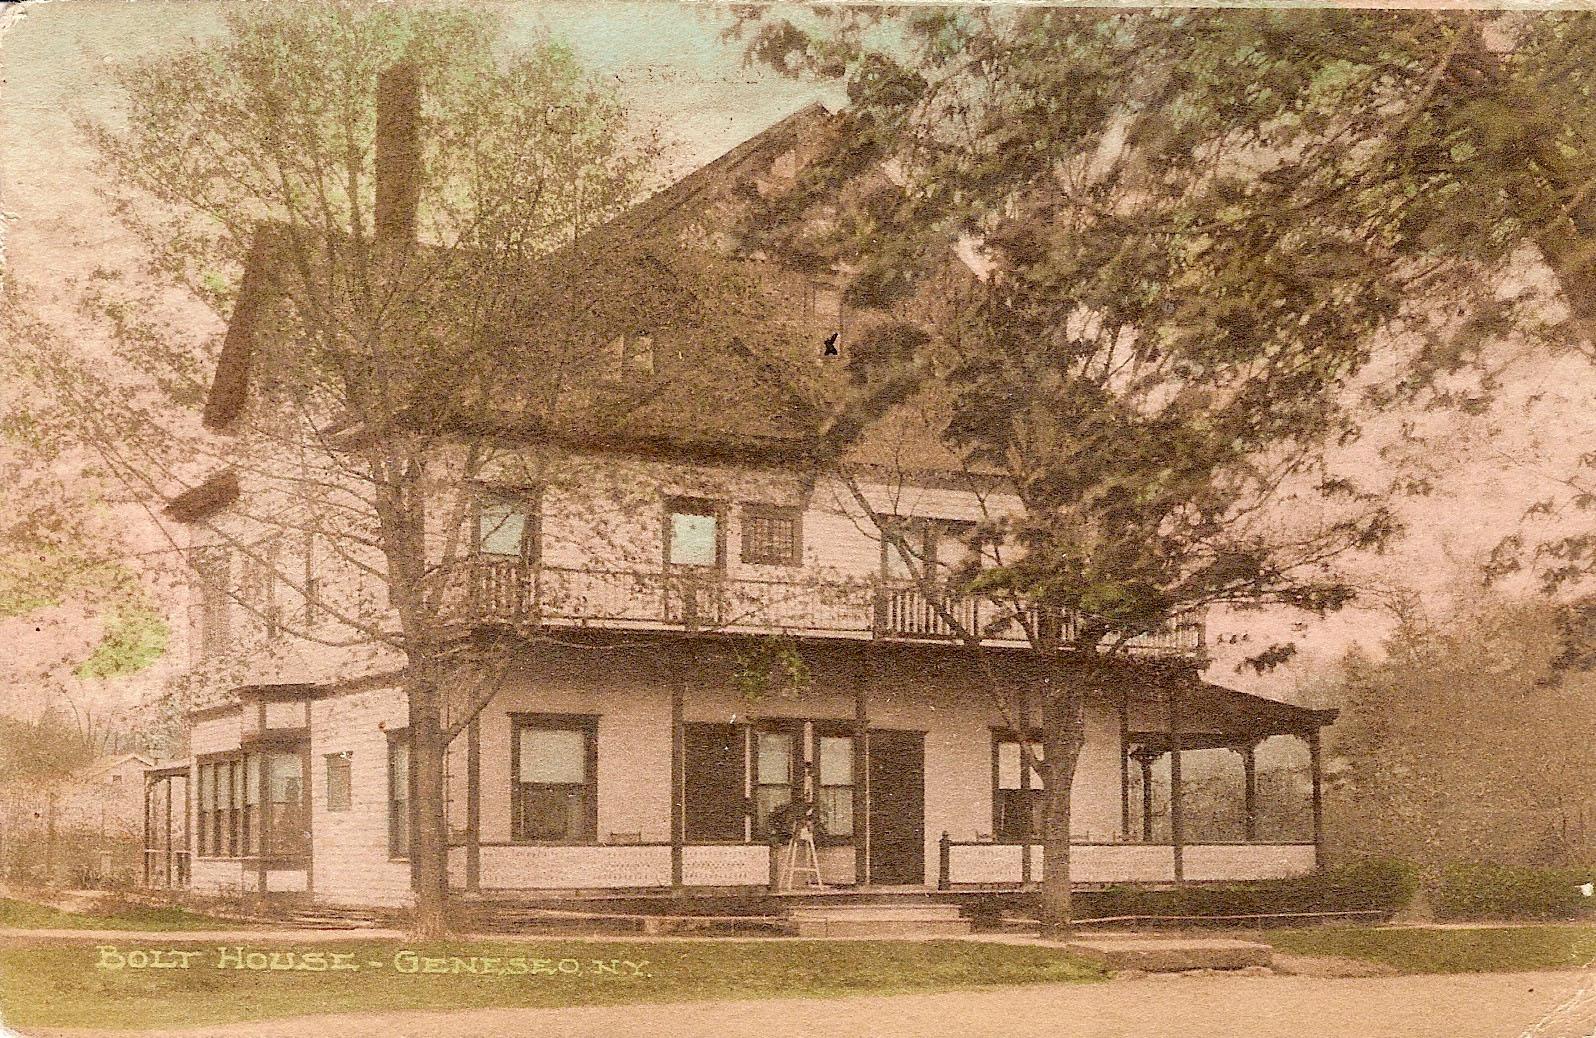 Bolt House c. 1920 Courtesy of Jon and Liz Porter